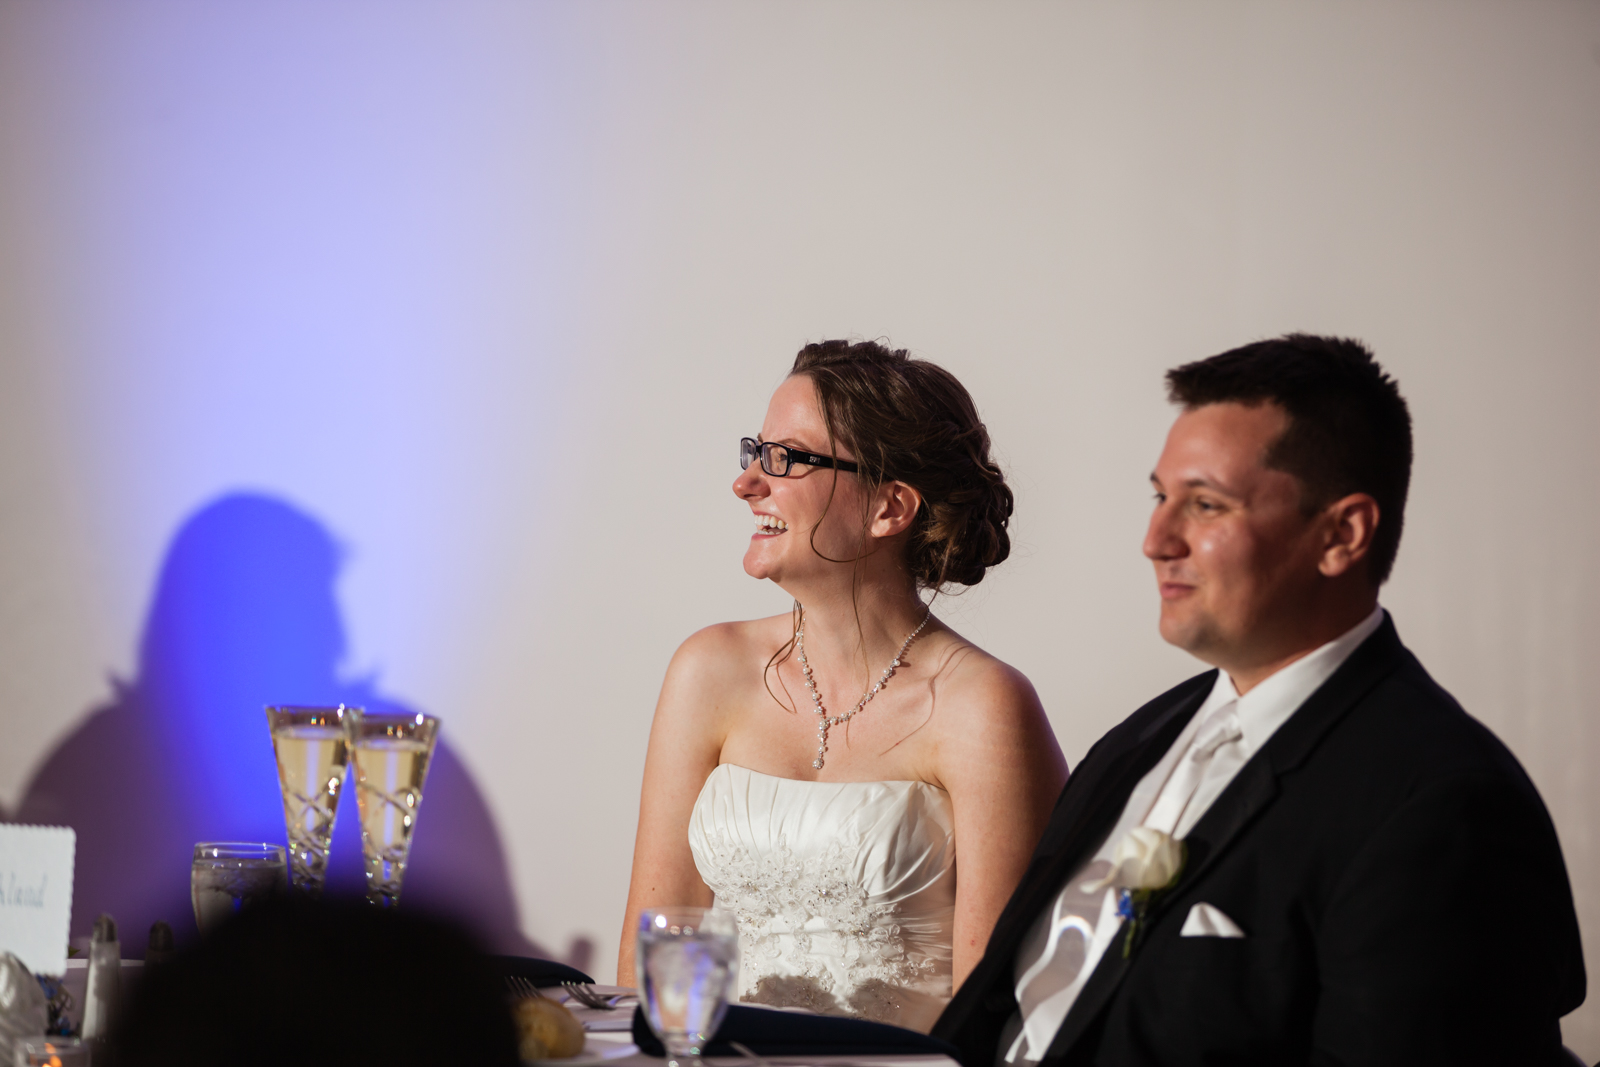 Eastons-Beach-Rotunda-Ballroom-Wedding-Newport-Rhode-Island-PhotographybyAmandaMorgan-104.jpg